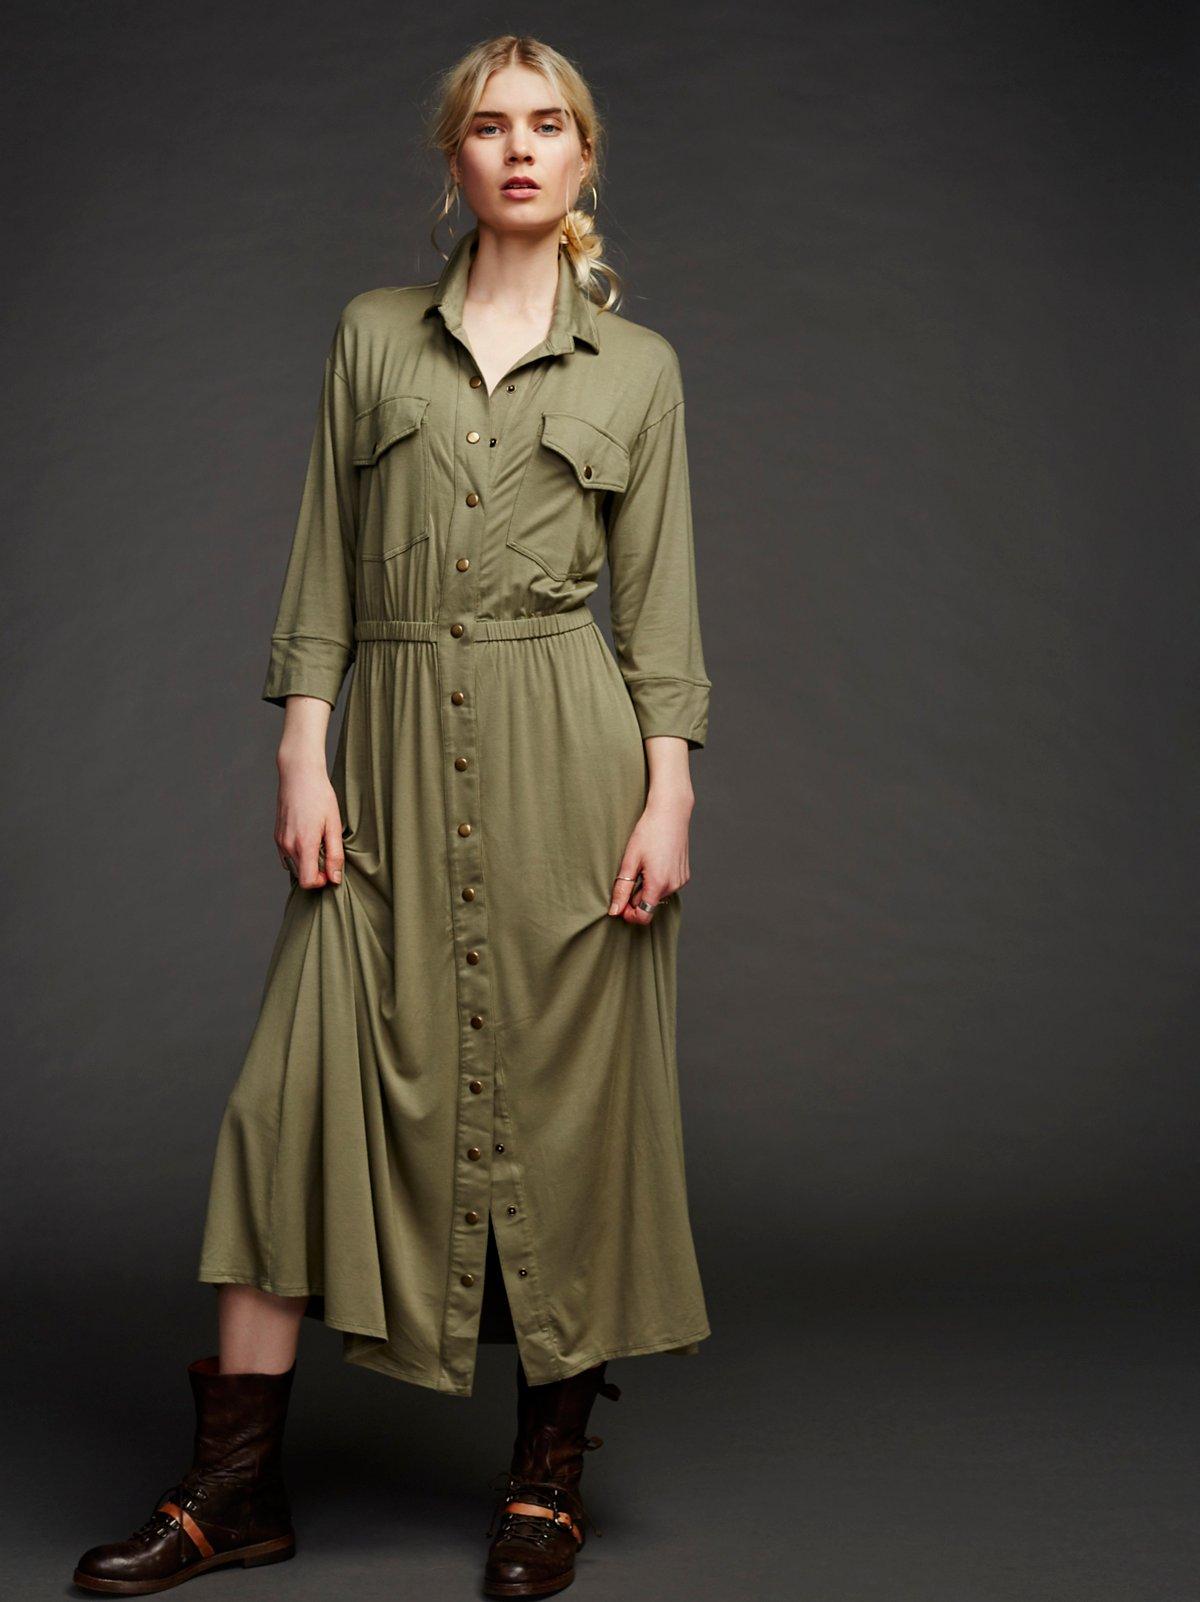 Mirette Dress